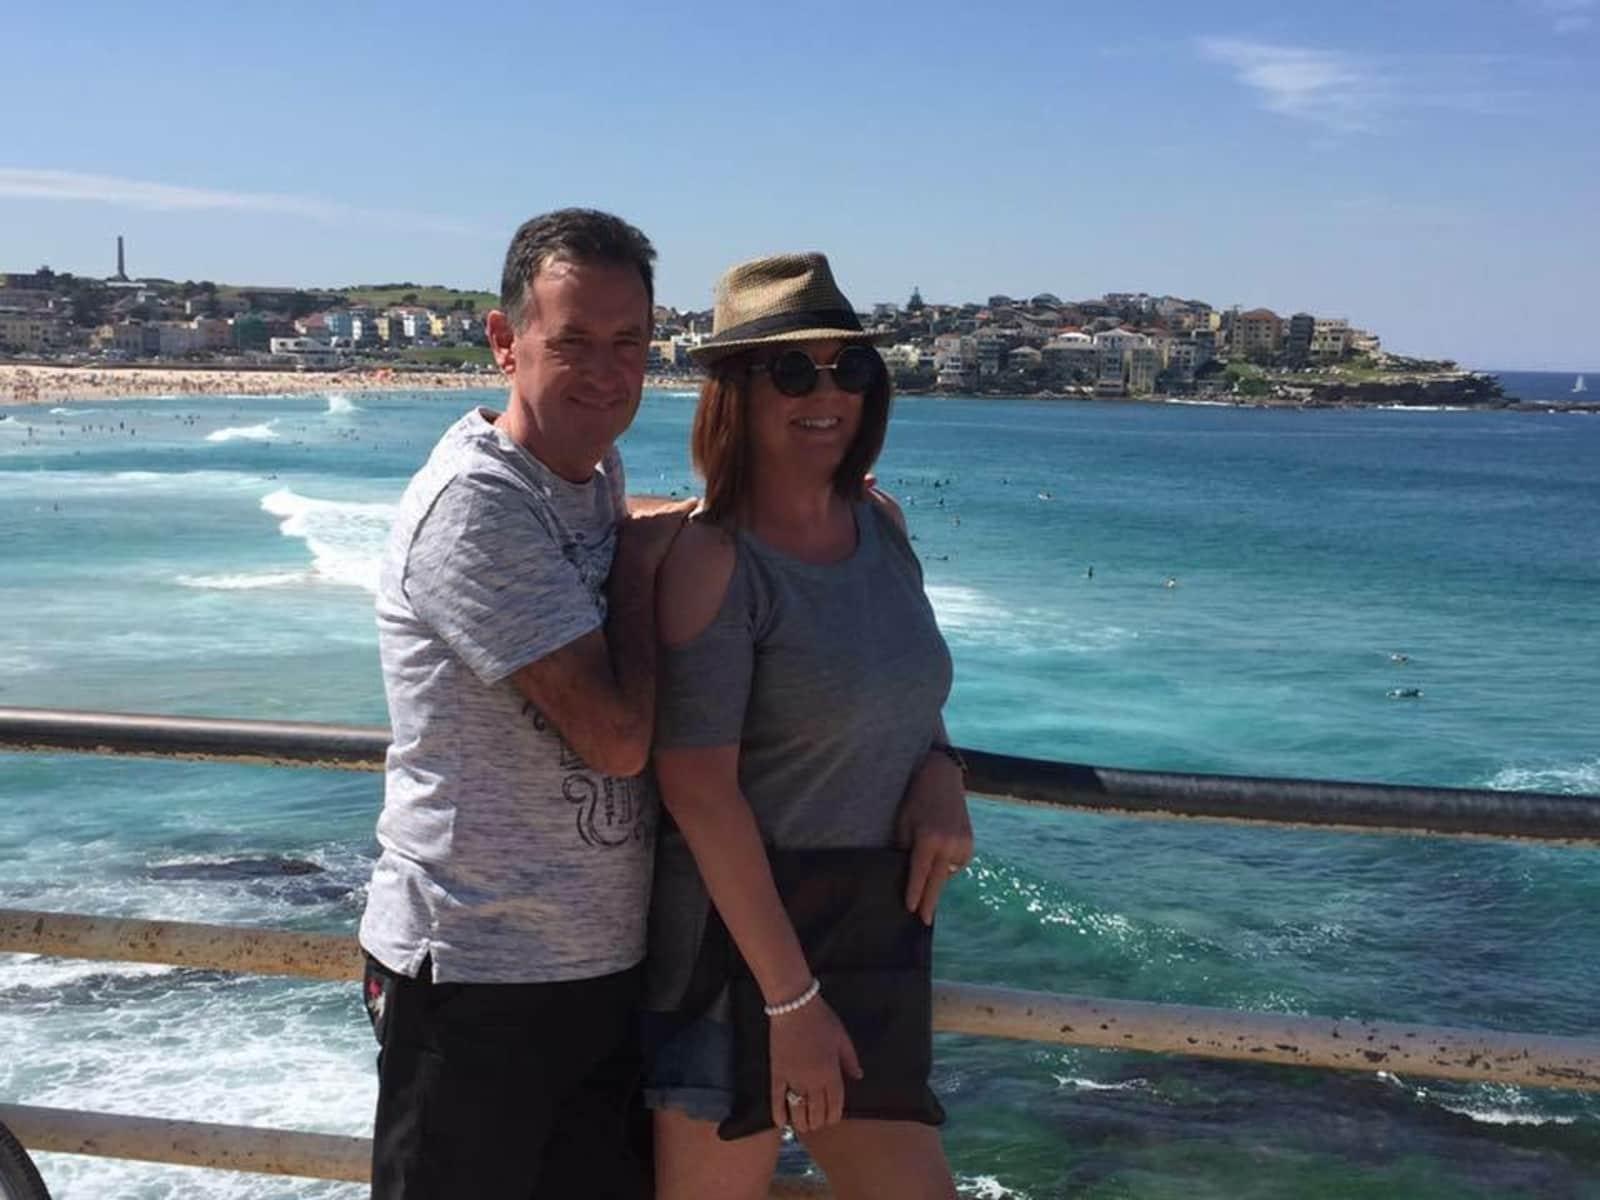 Sharon & John from Perth, Western Australia, Australia